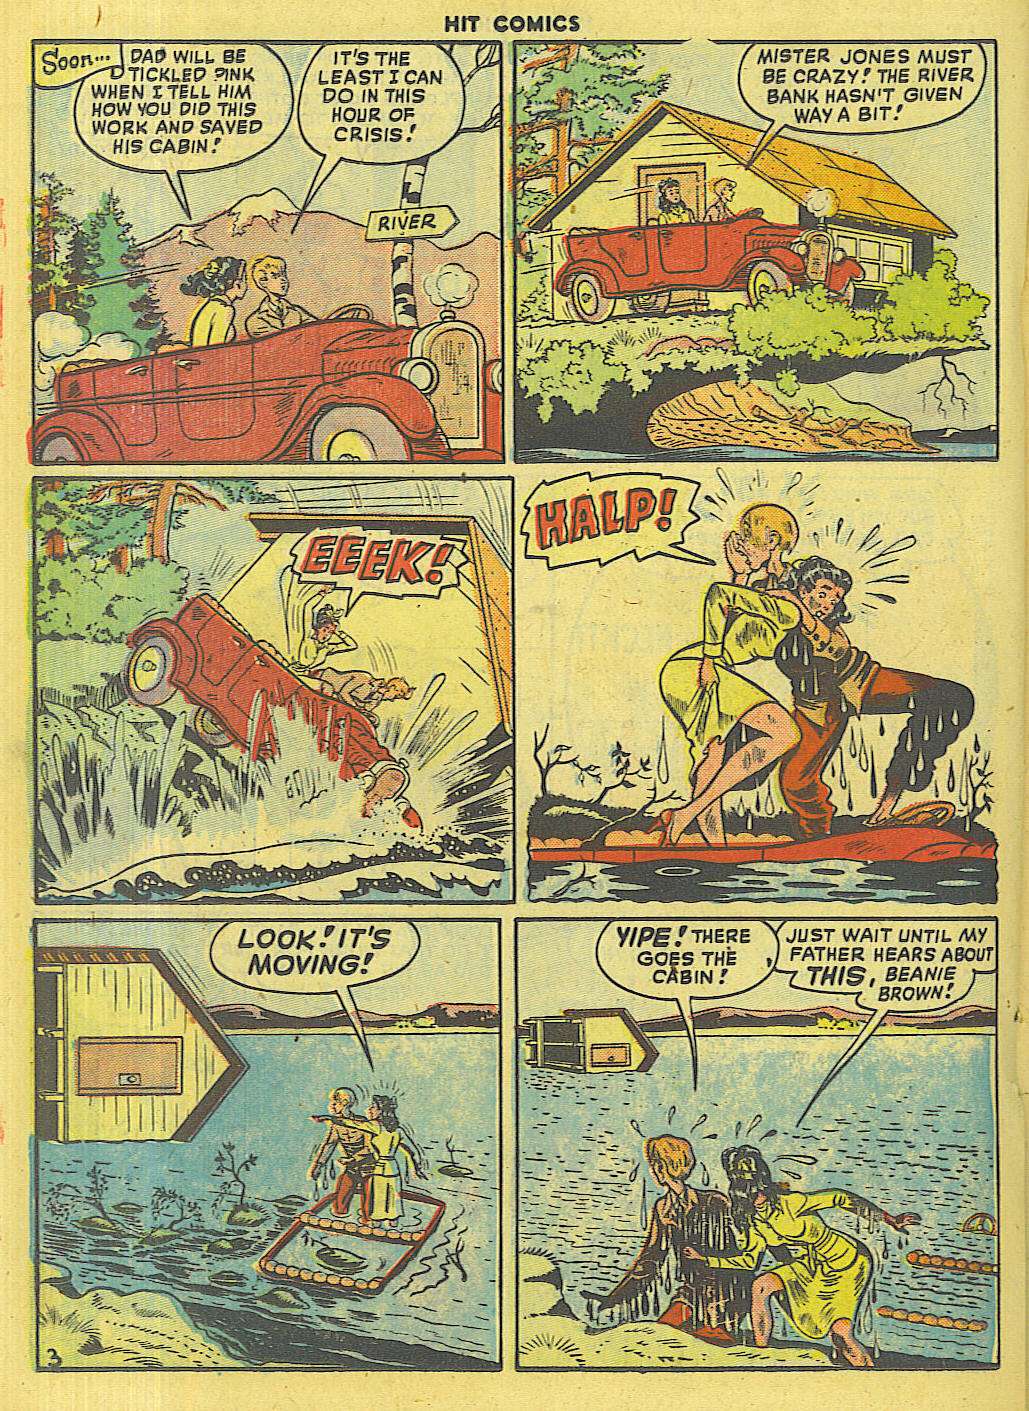 Read online Hit Comics comic -  Issue #56 - 28